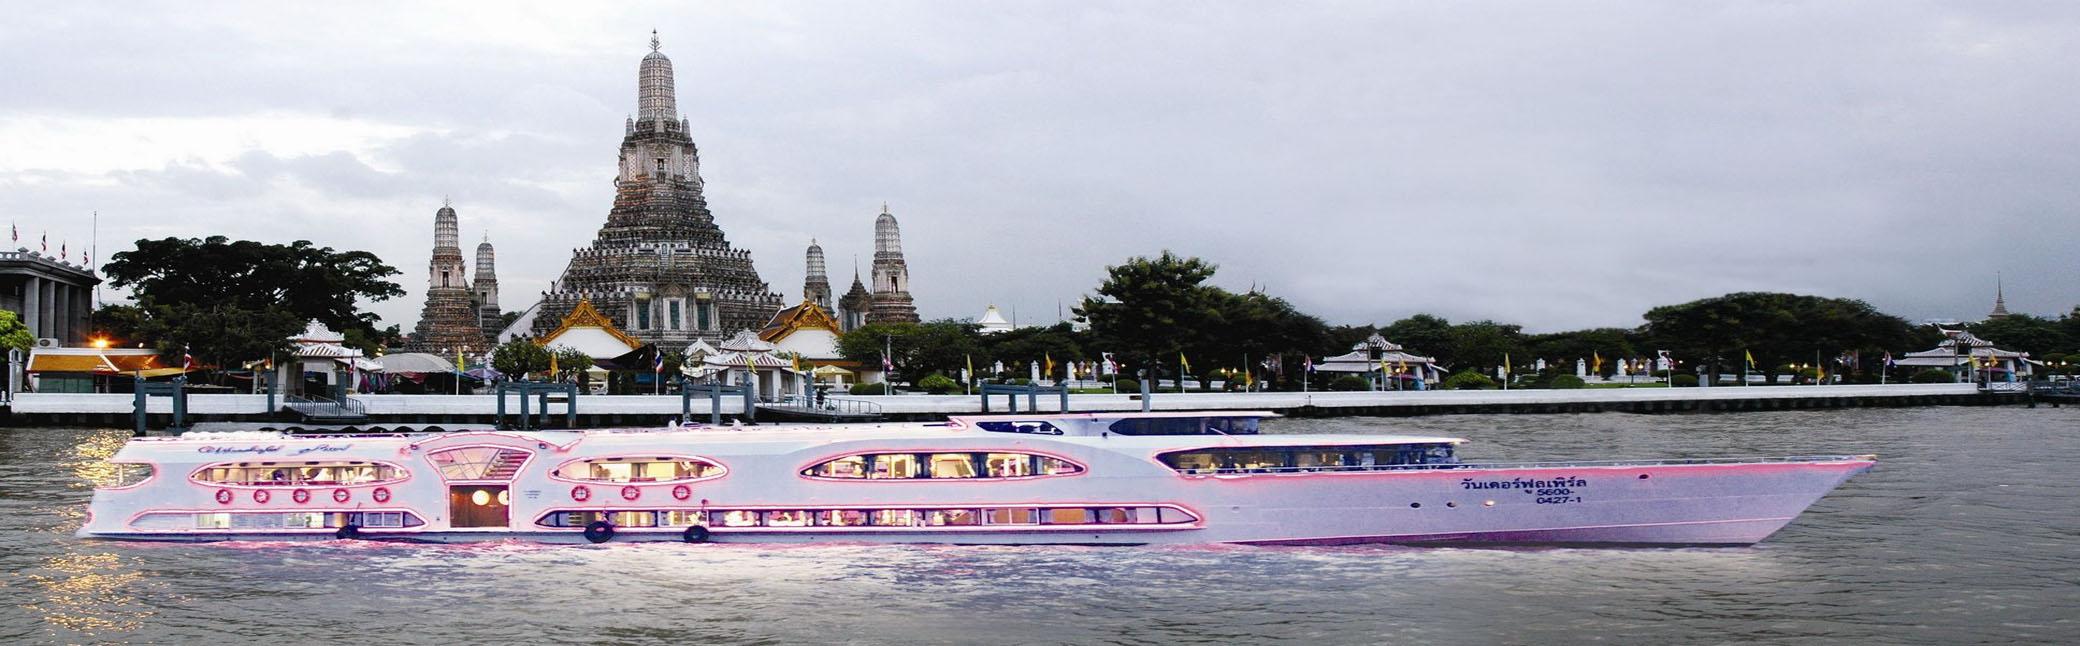 Wonderful Pearl Cruise ดินเนอร์ล่องเรือสำราญสุดหรู  วันเดอร์ฟูล เพิร์ล ครูซส์